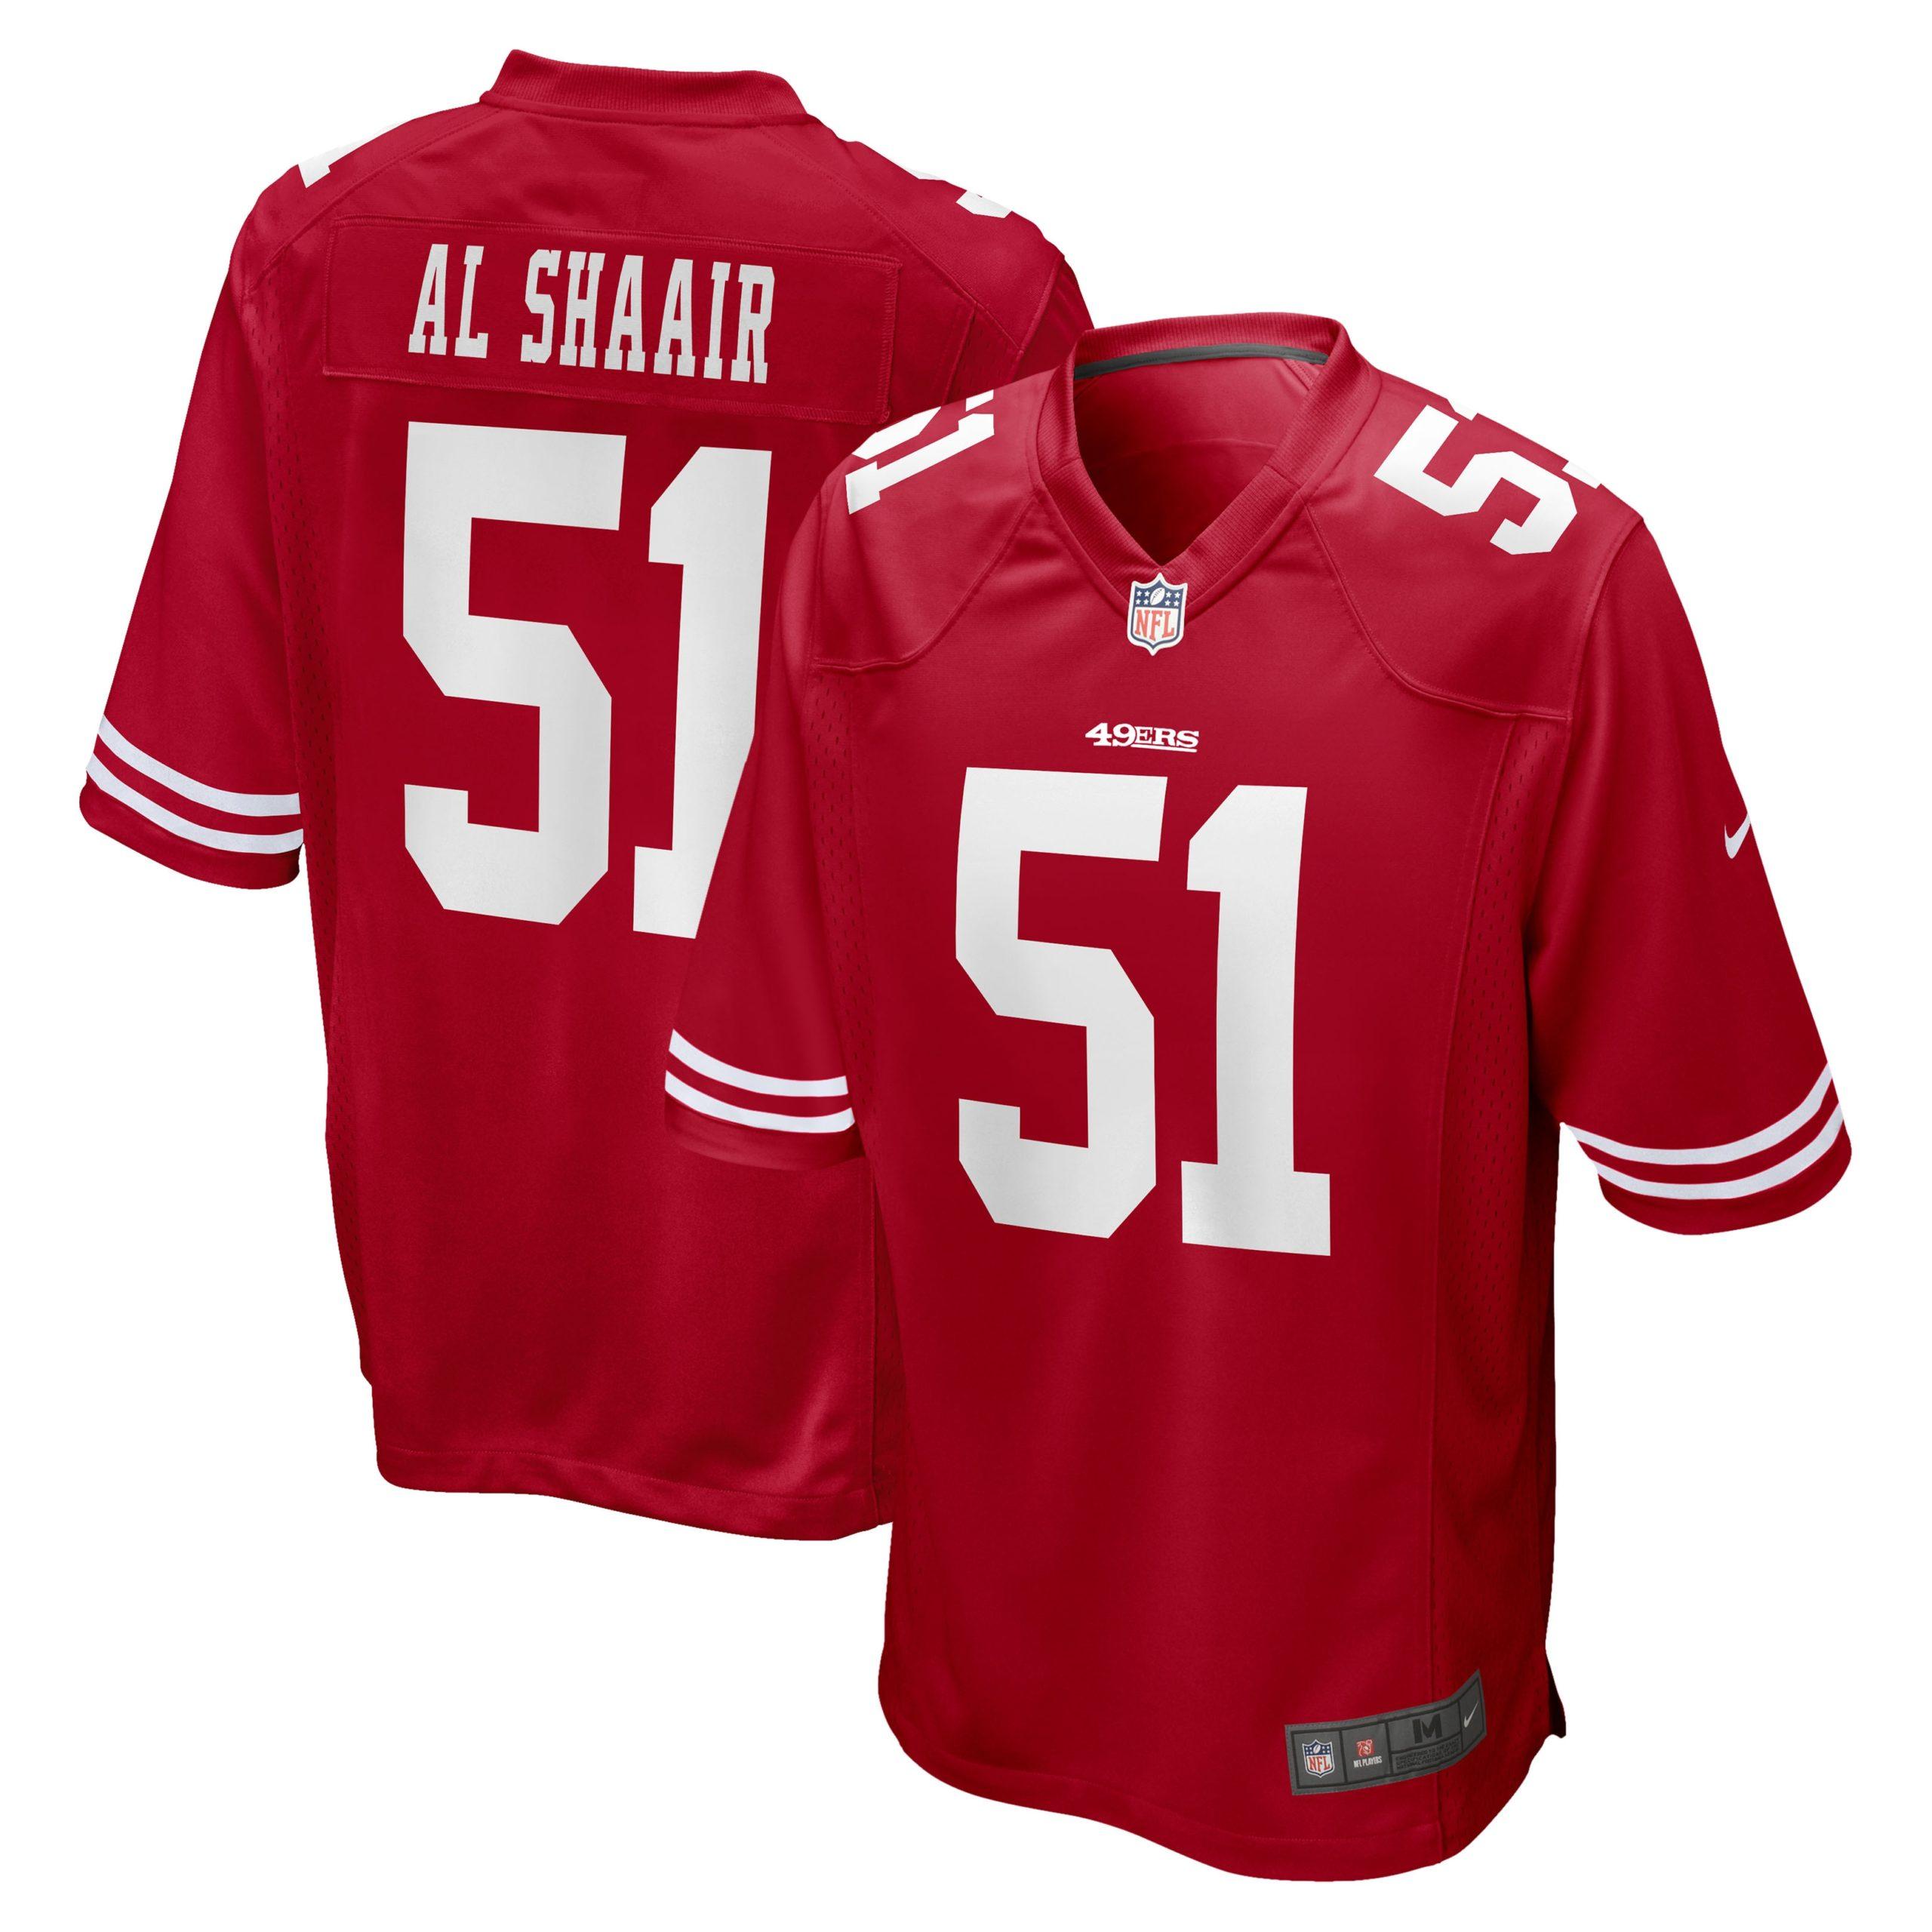 Azeez Al-Shaair San Francisco 49ers Nike Team Game Jersey - Scarlet